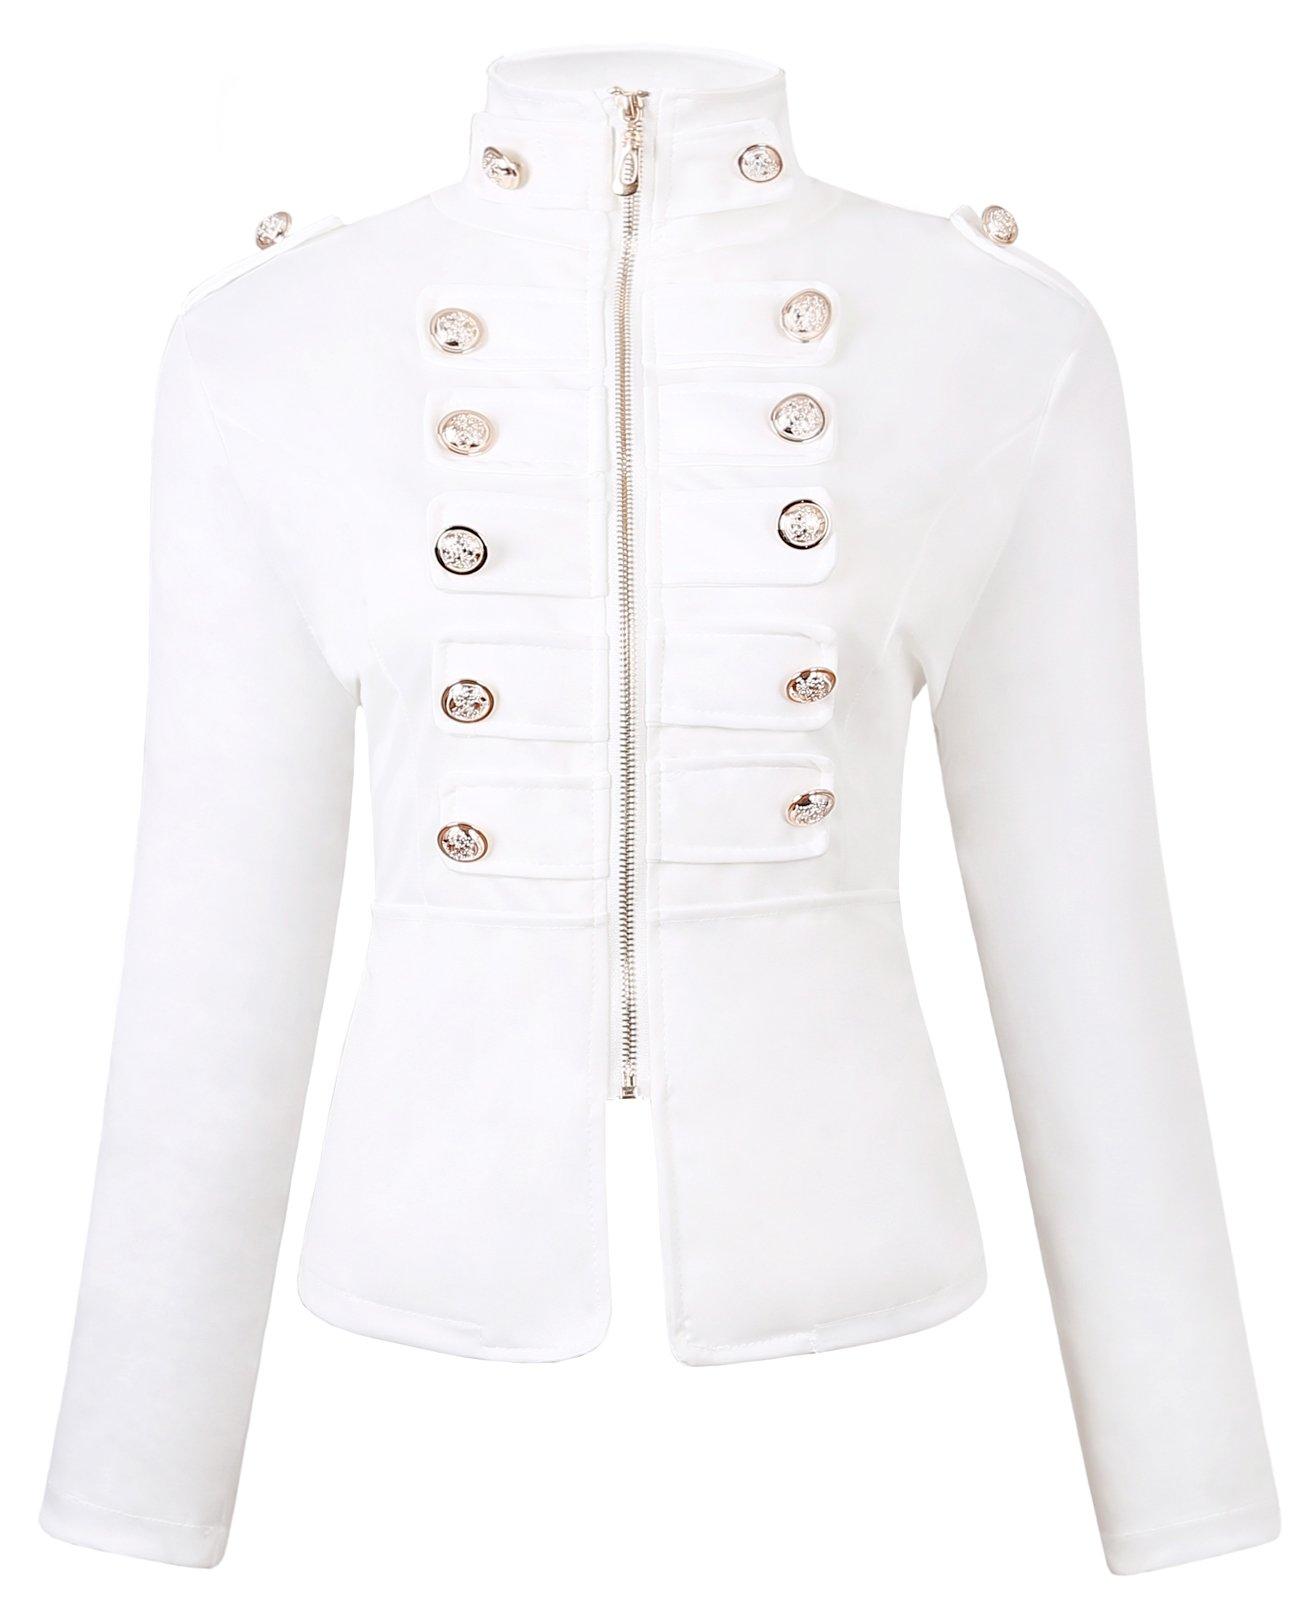 AURNEW WomensCasualDoubleBreastedZip FrontHighNeckSlimFitMilitary Light Jacket (White, M)